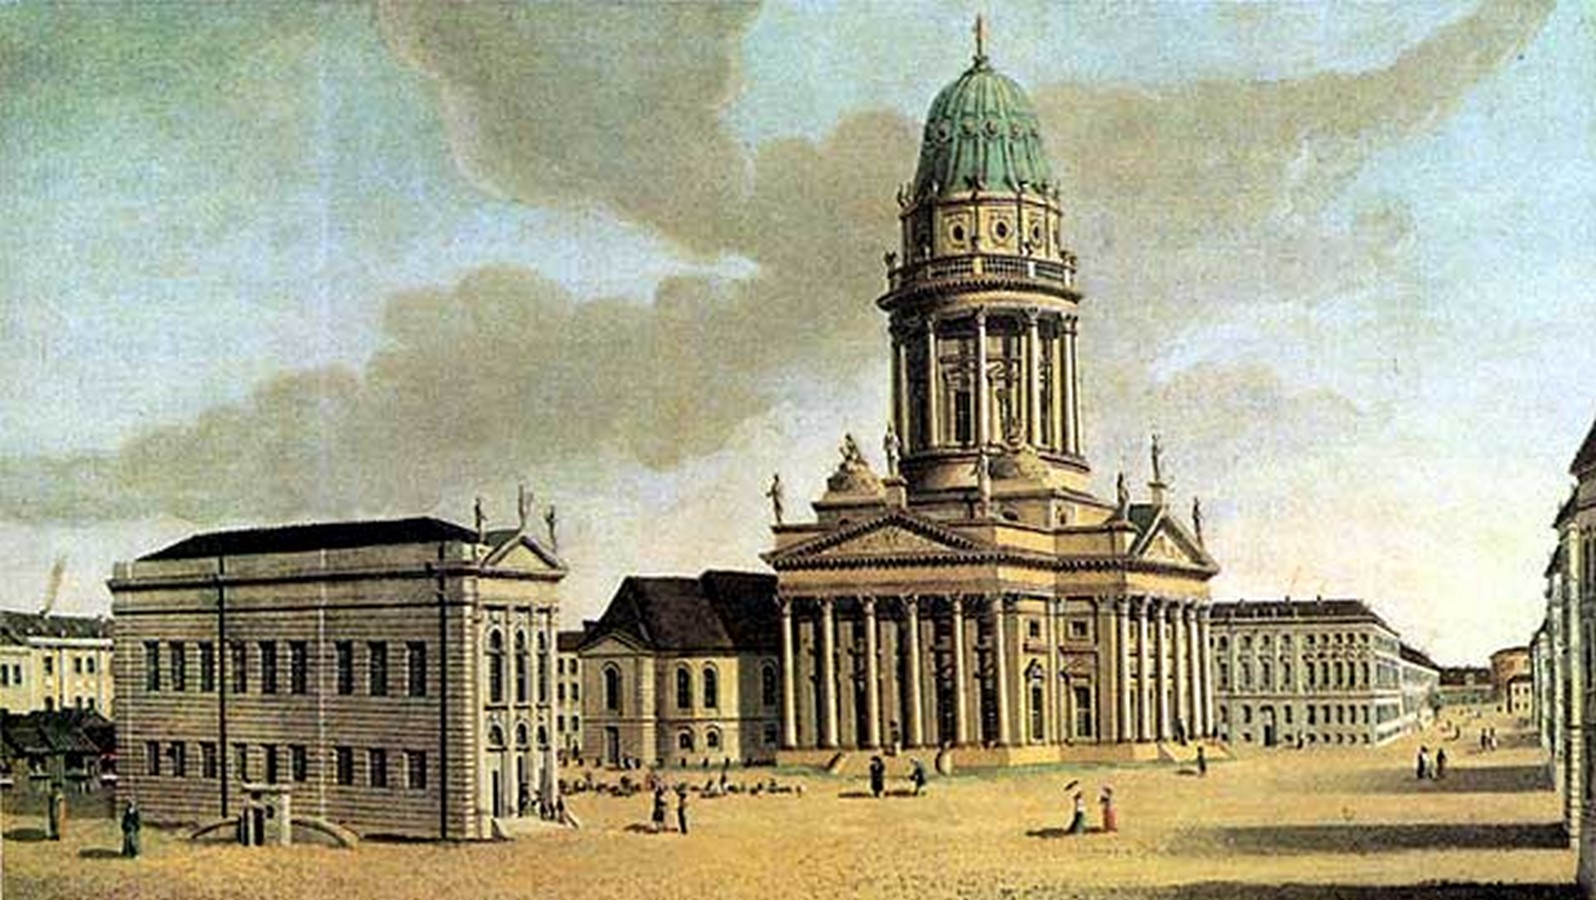 Konzerthaus by Karl Fr2iedrich Schinkel: Witness of Time - Sheet